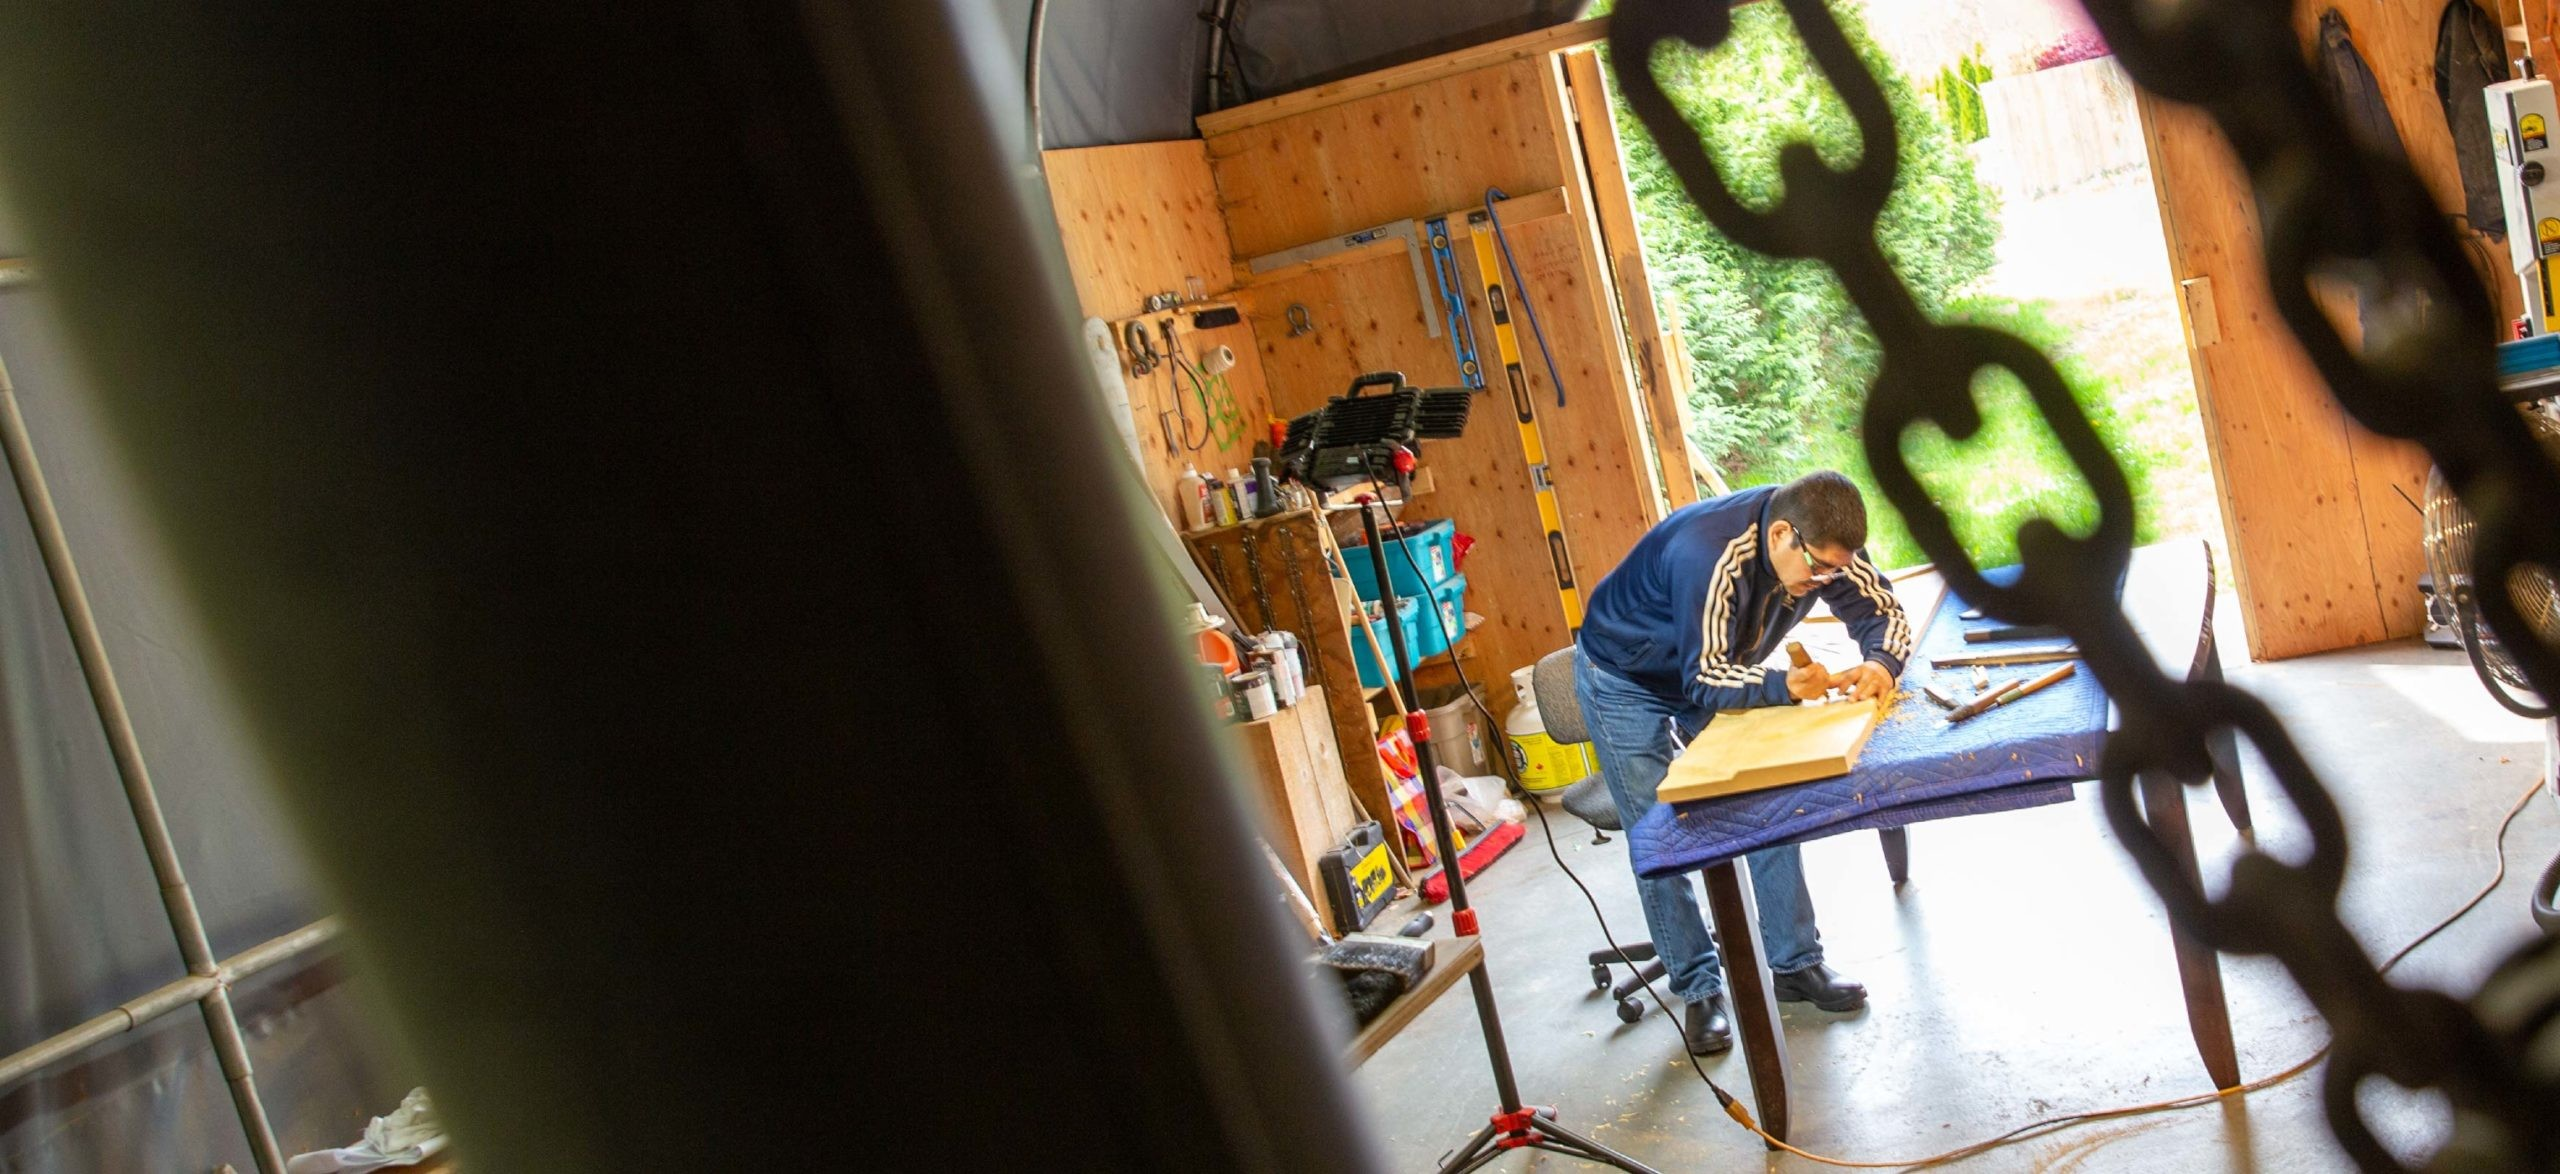 Musqueam artist Brett Sparrow carves artwork in his workshop